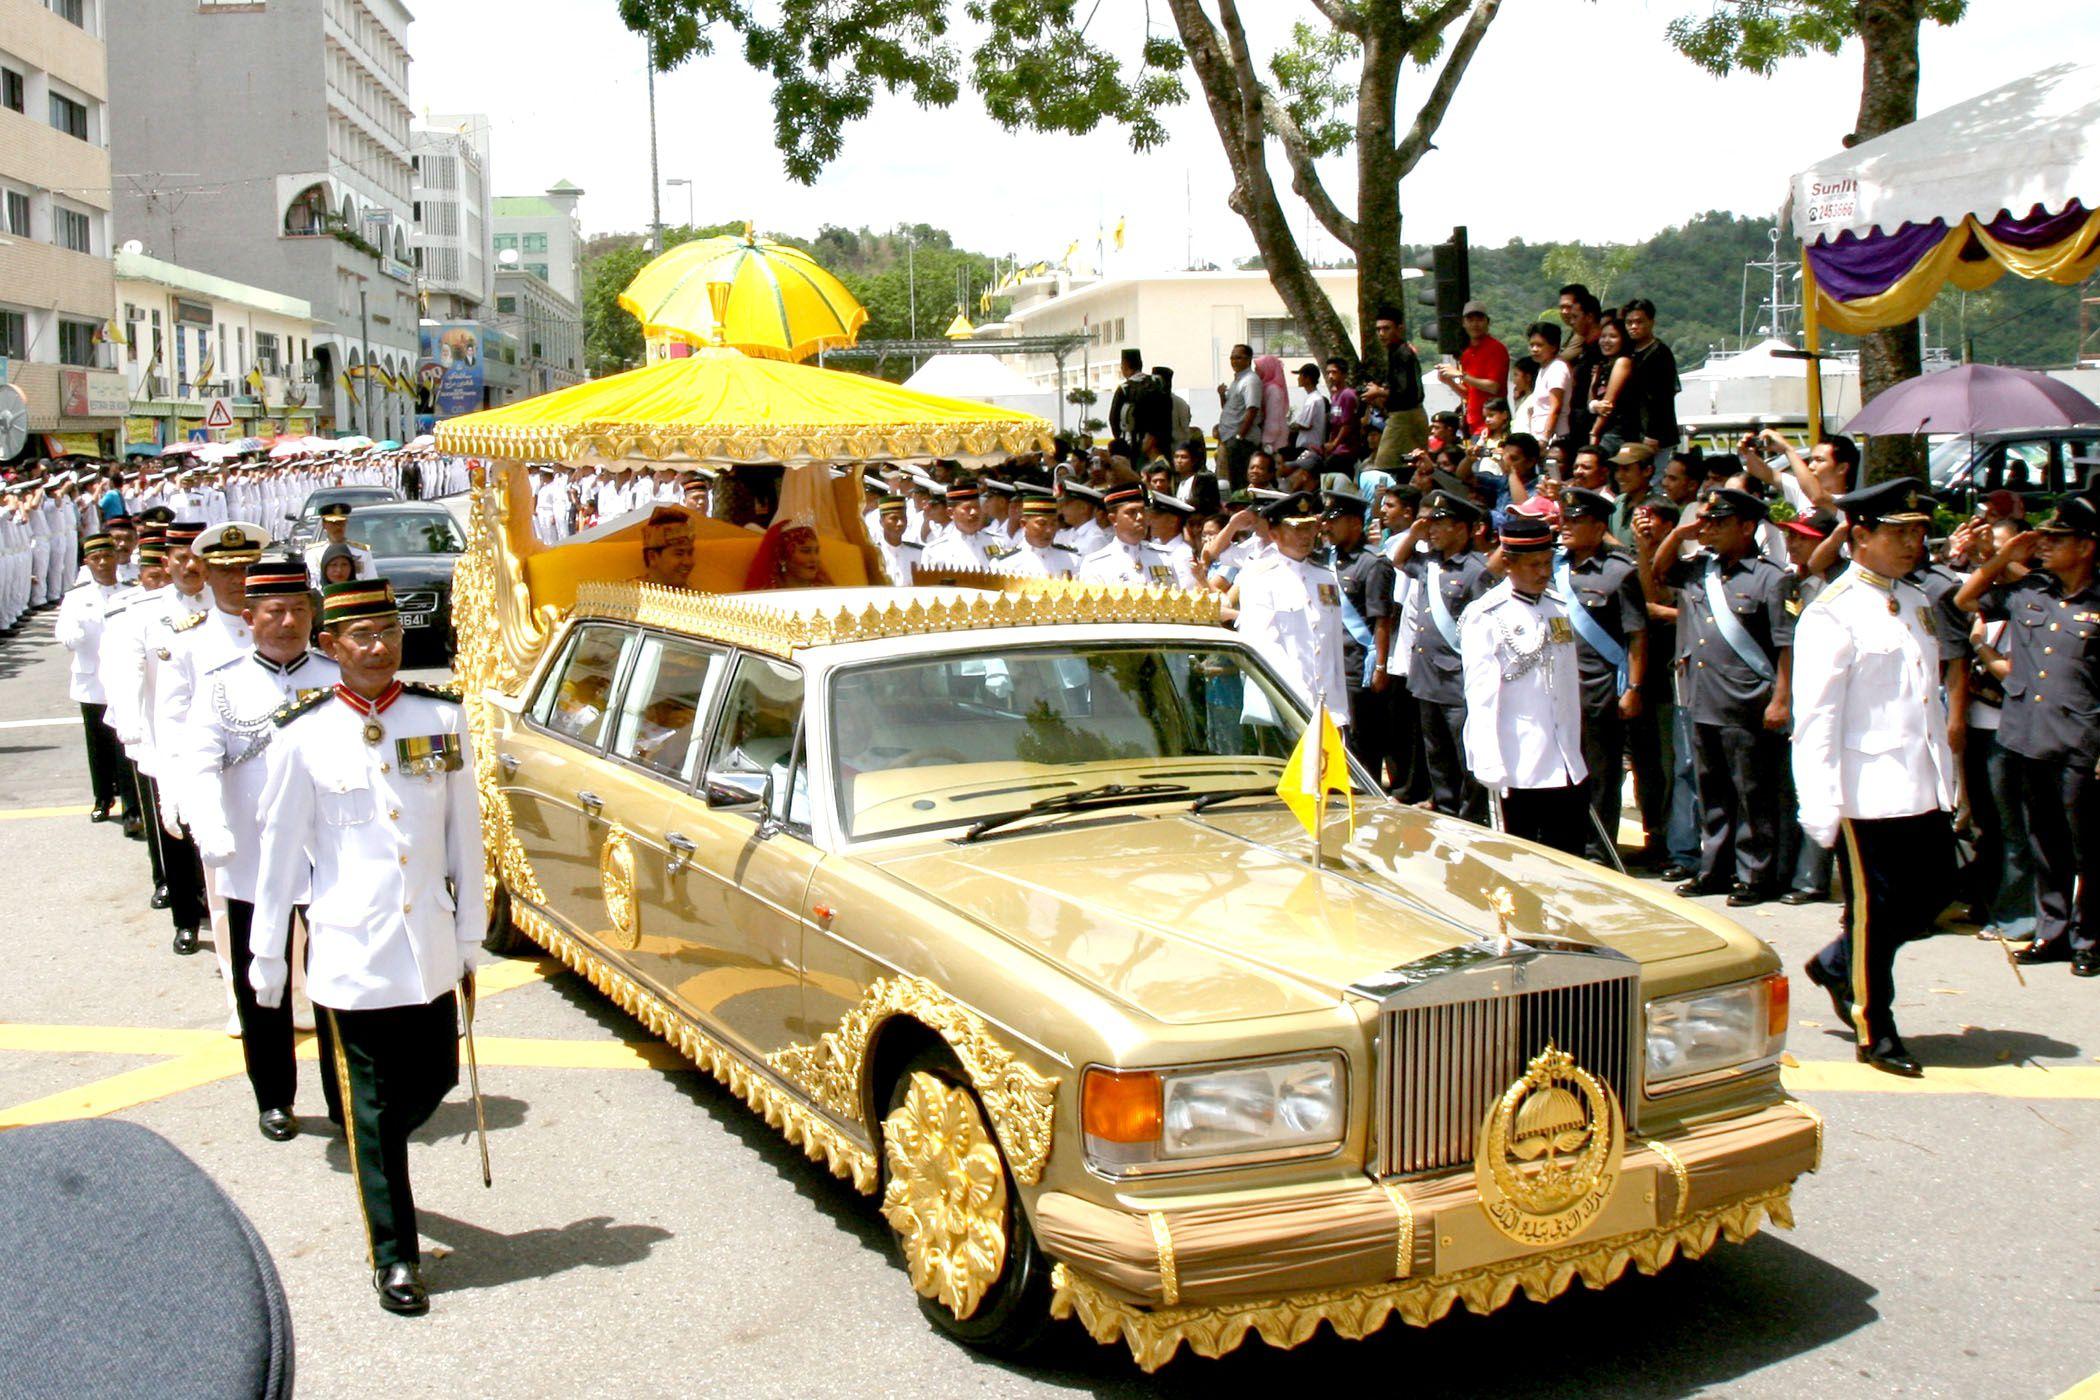 Hassanal Bolkiah, sultán de Brunéi